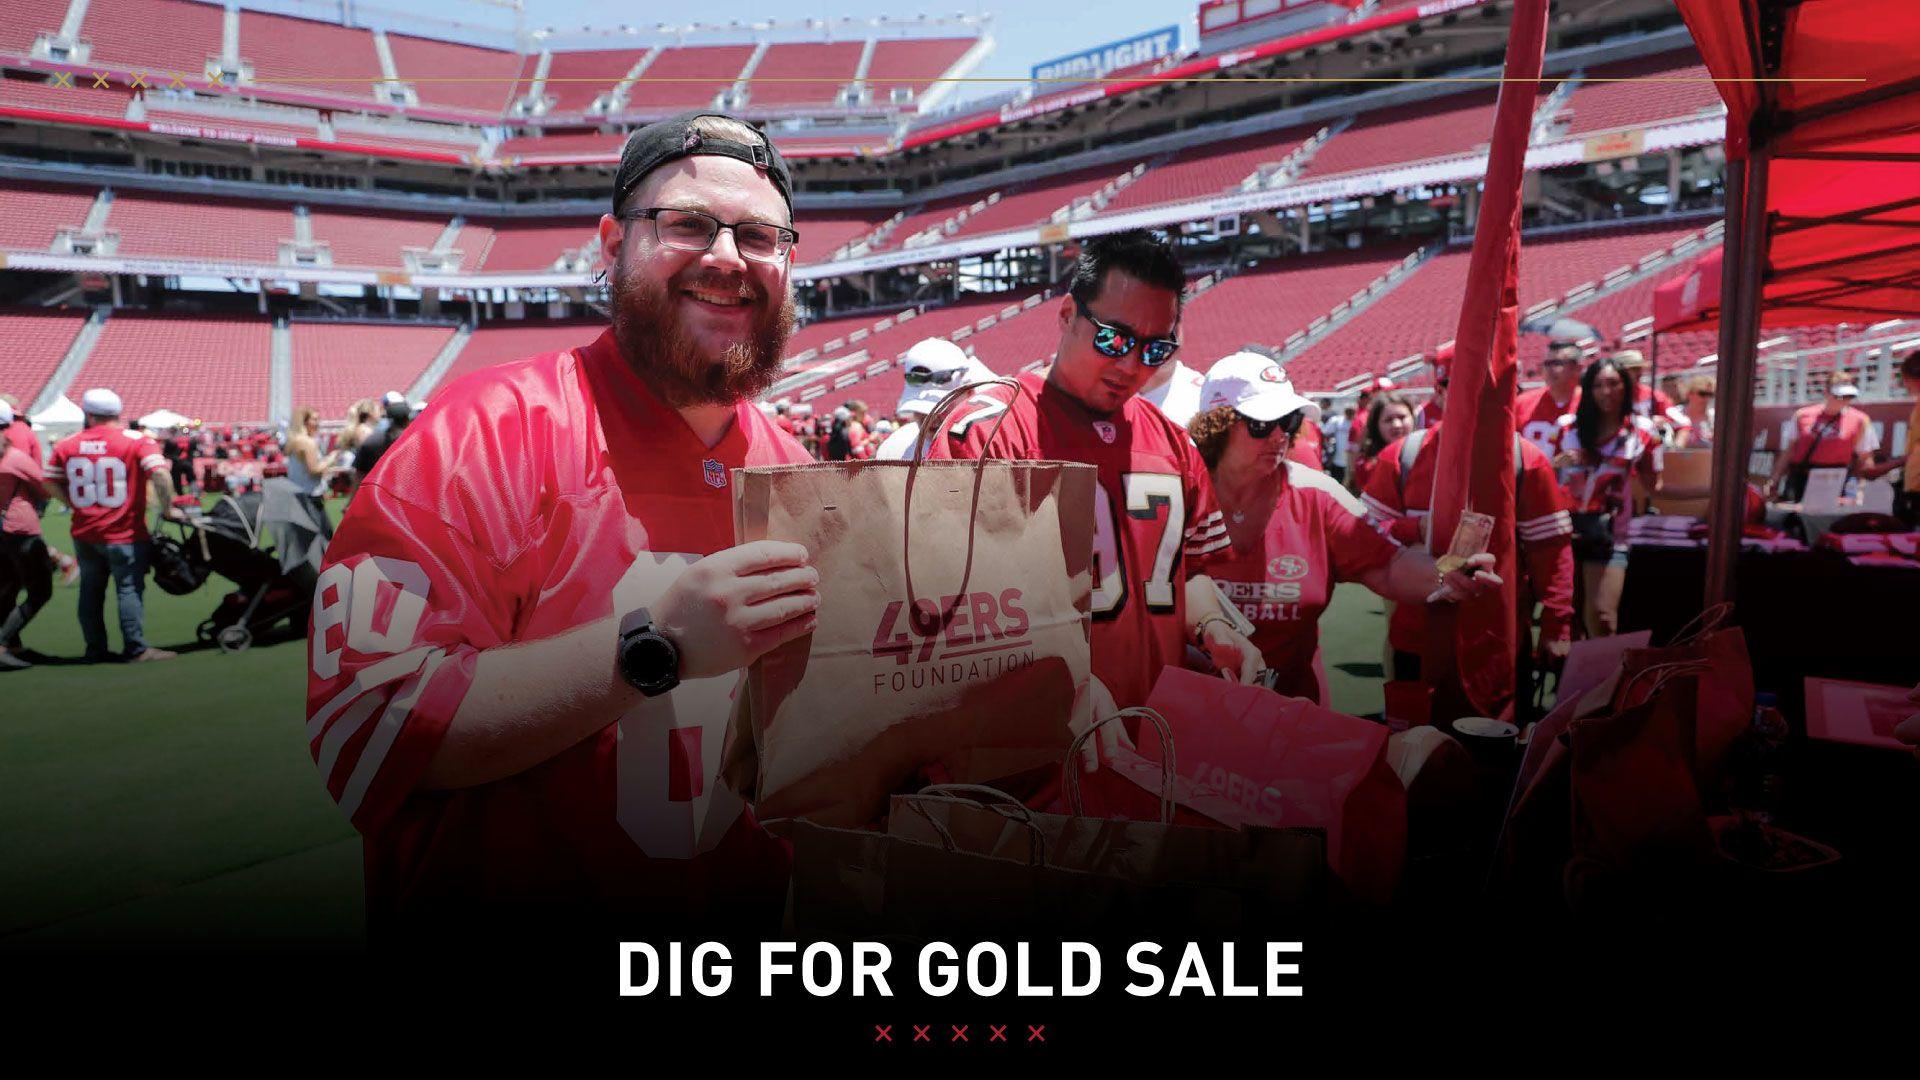 Dig For Gold Sale